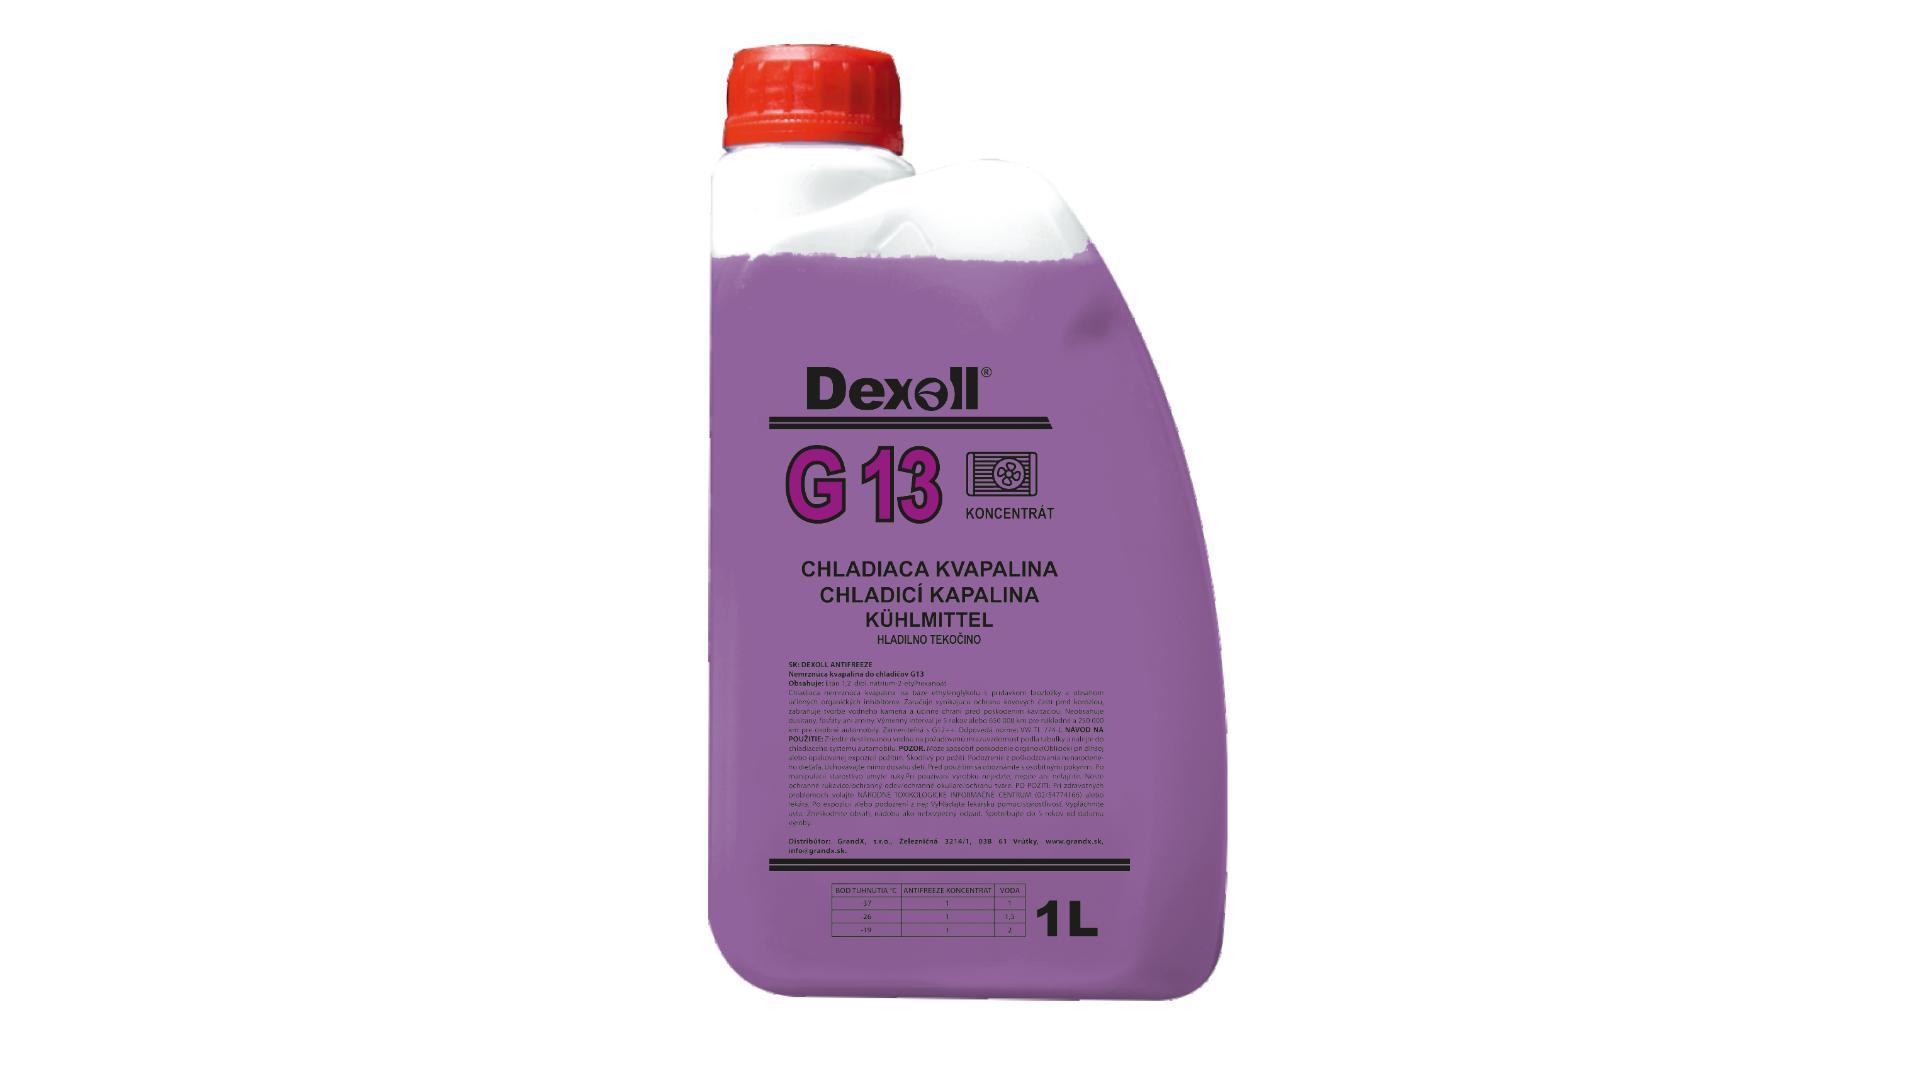 DEXOLL Nemrznúca zmes G13 1L